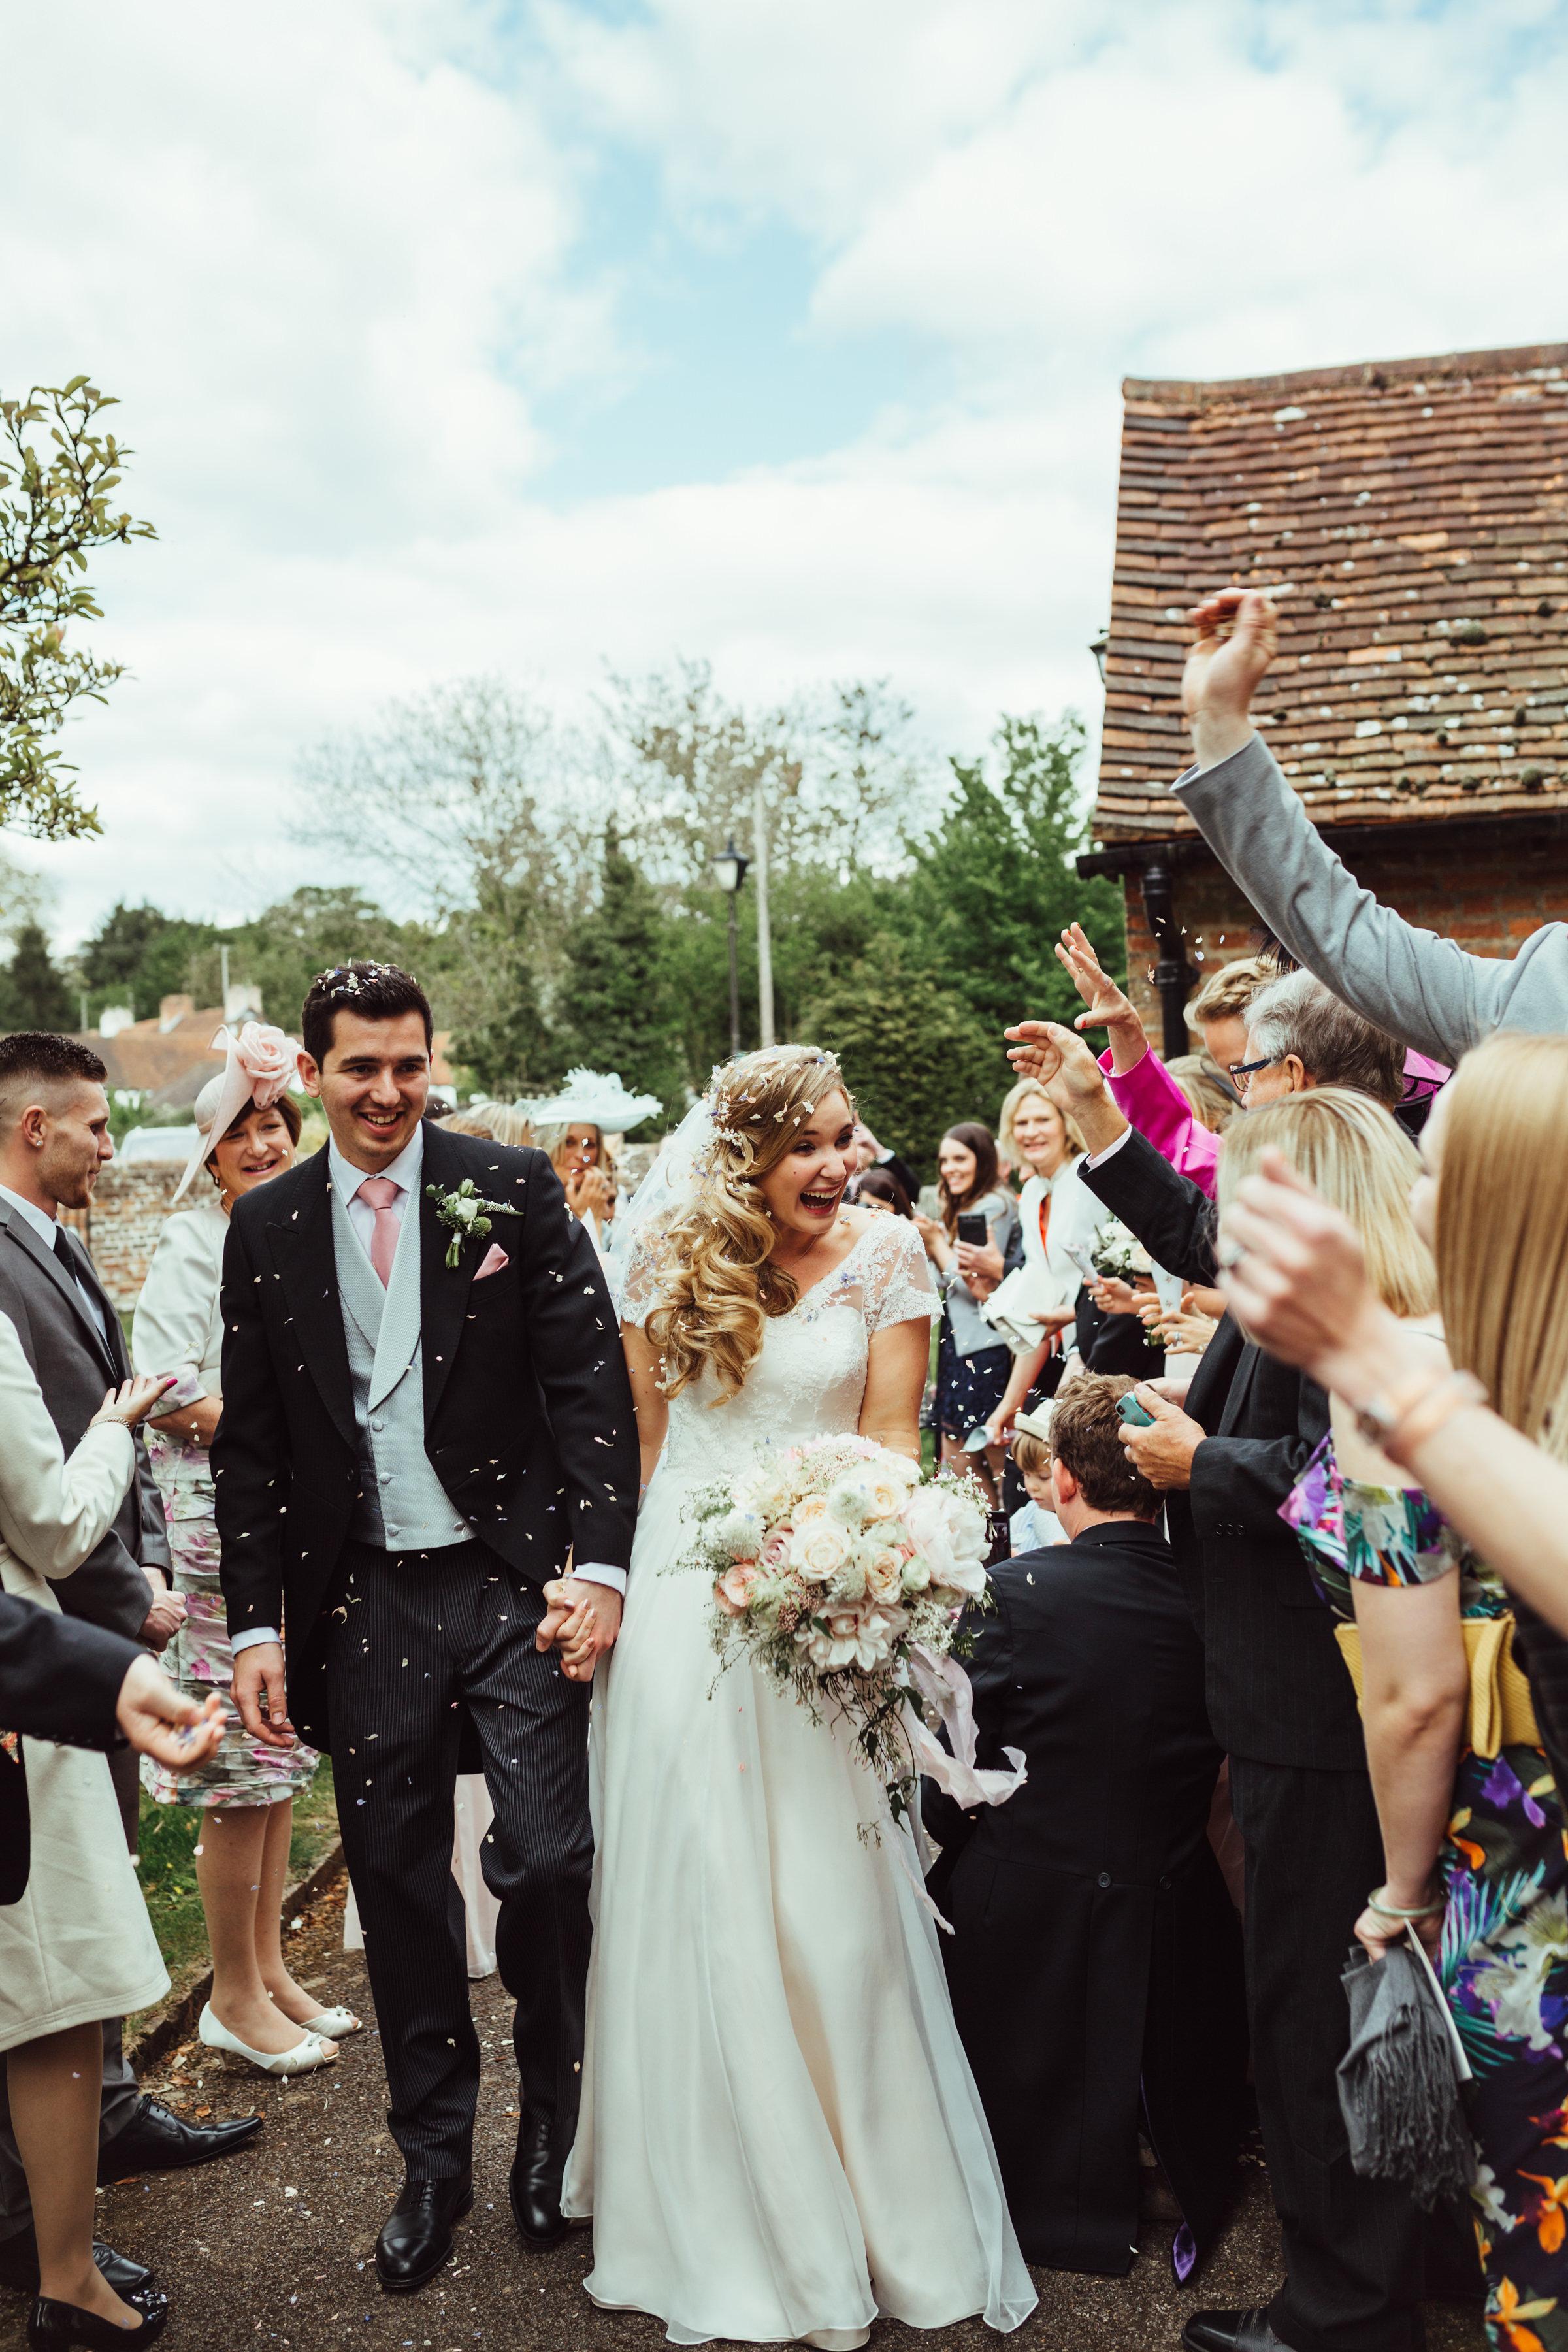 Dan-Grace-Wedding-598.jpg